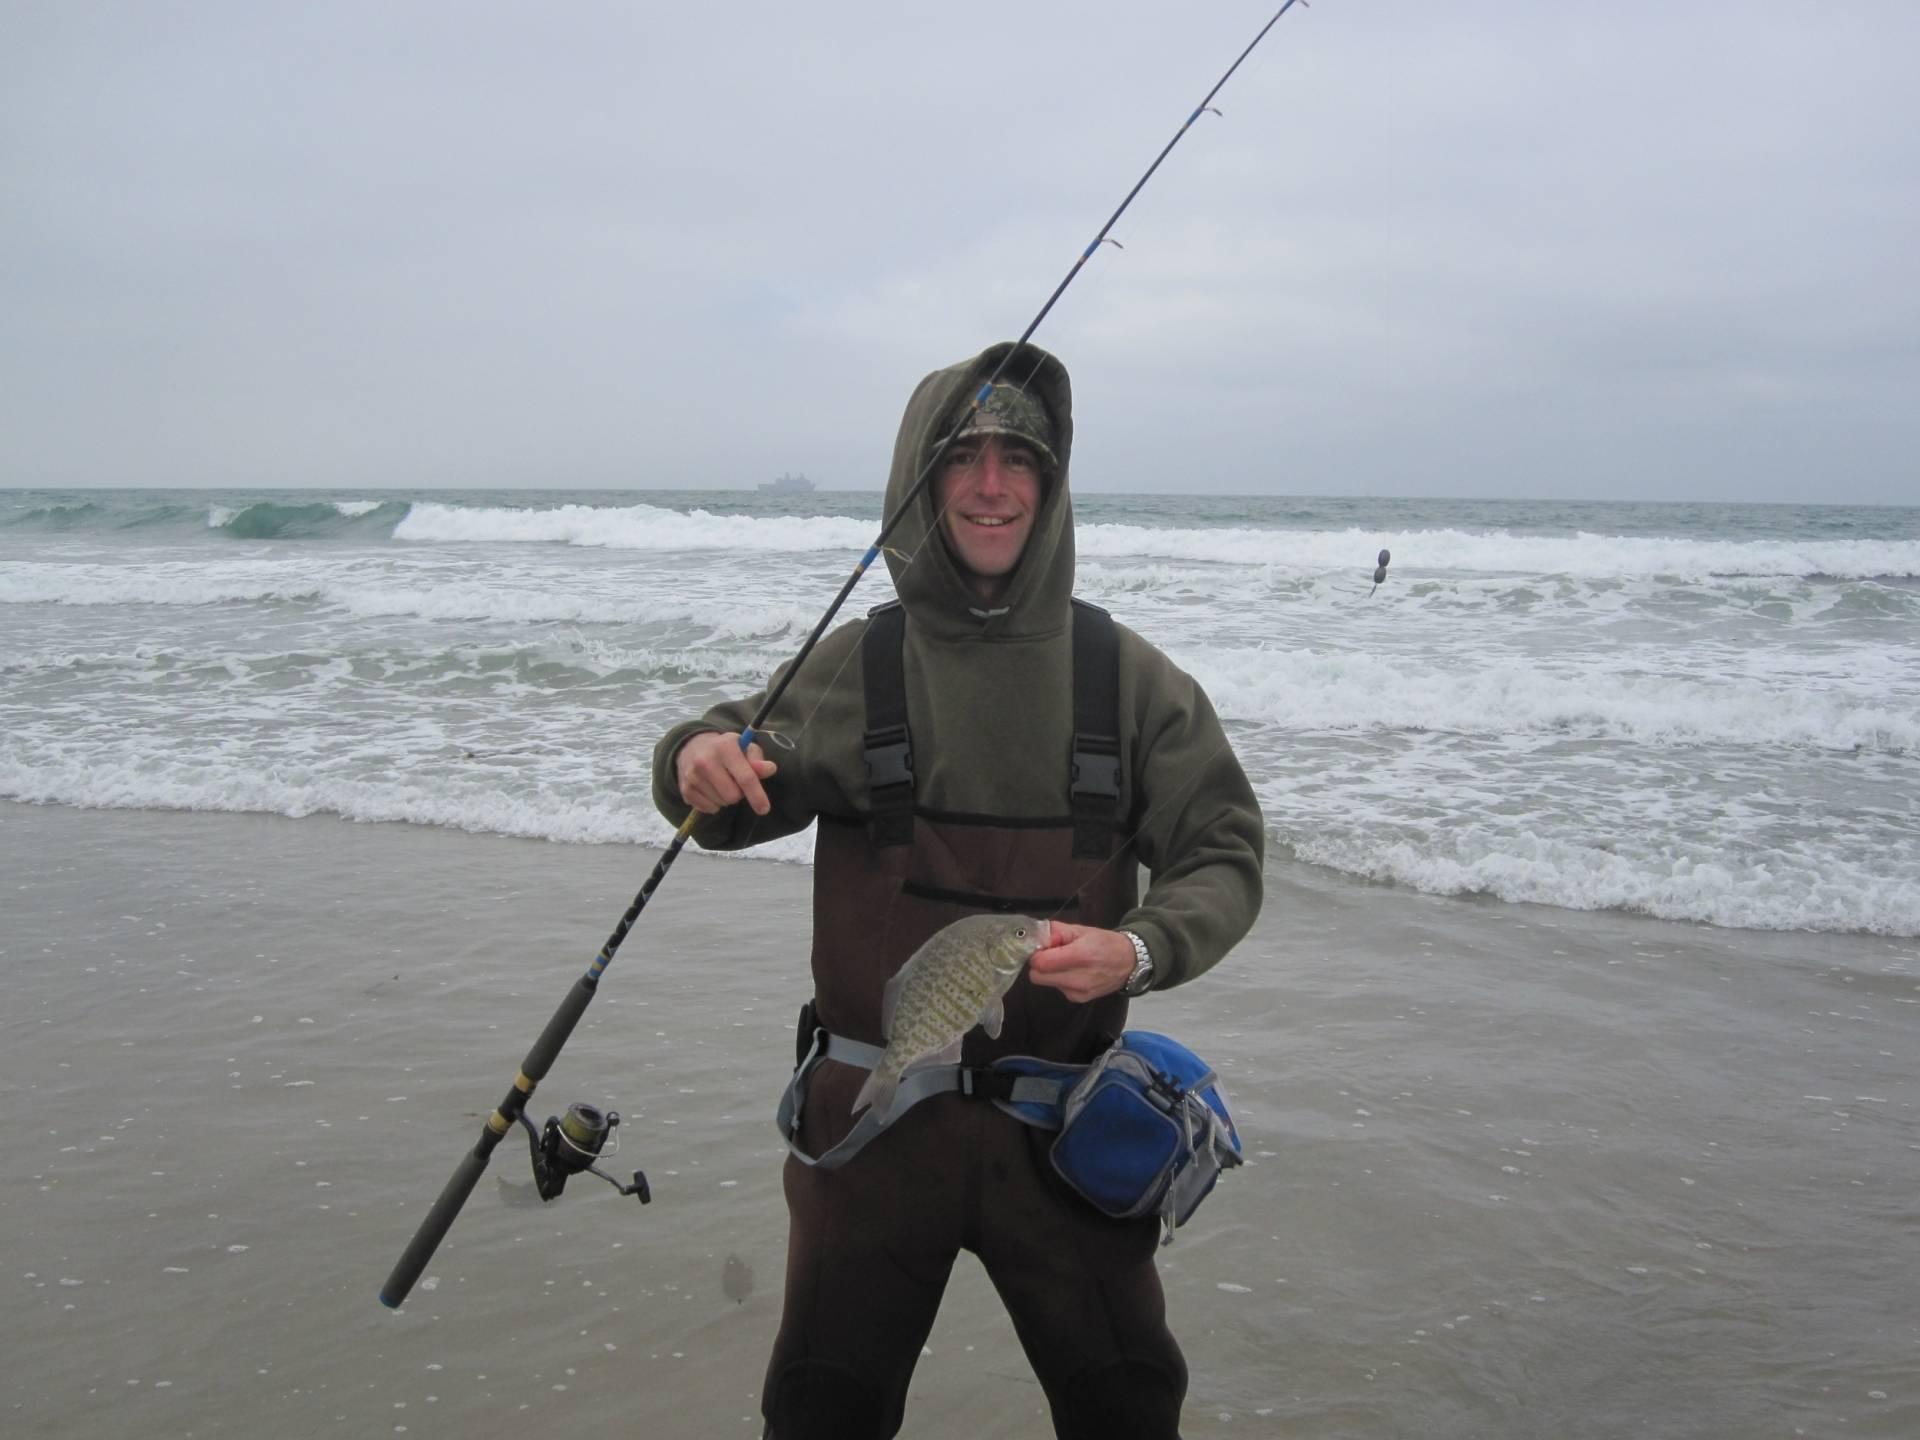 Surf fishing waist tackle bag bloodydecks for Surf fishing lures